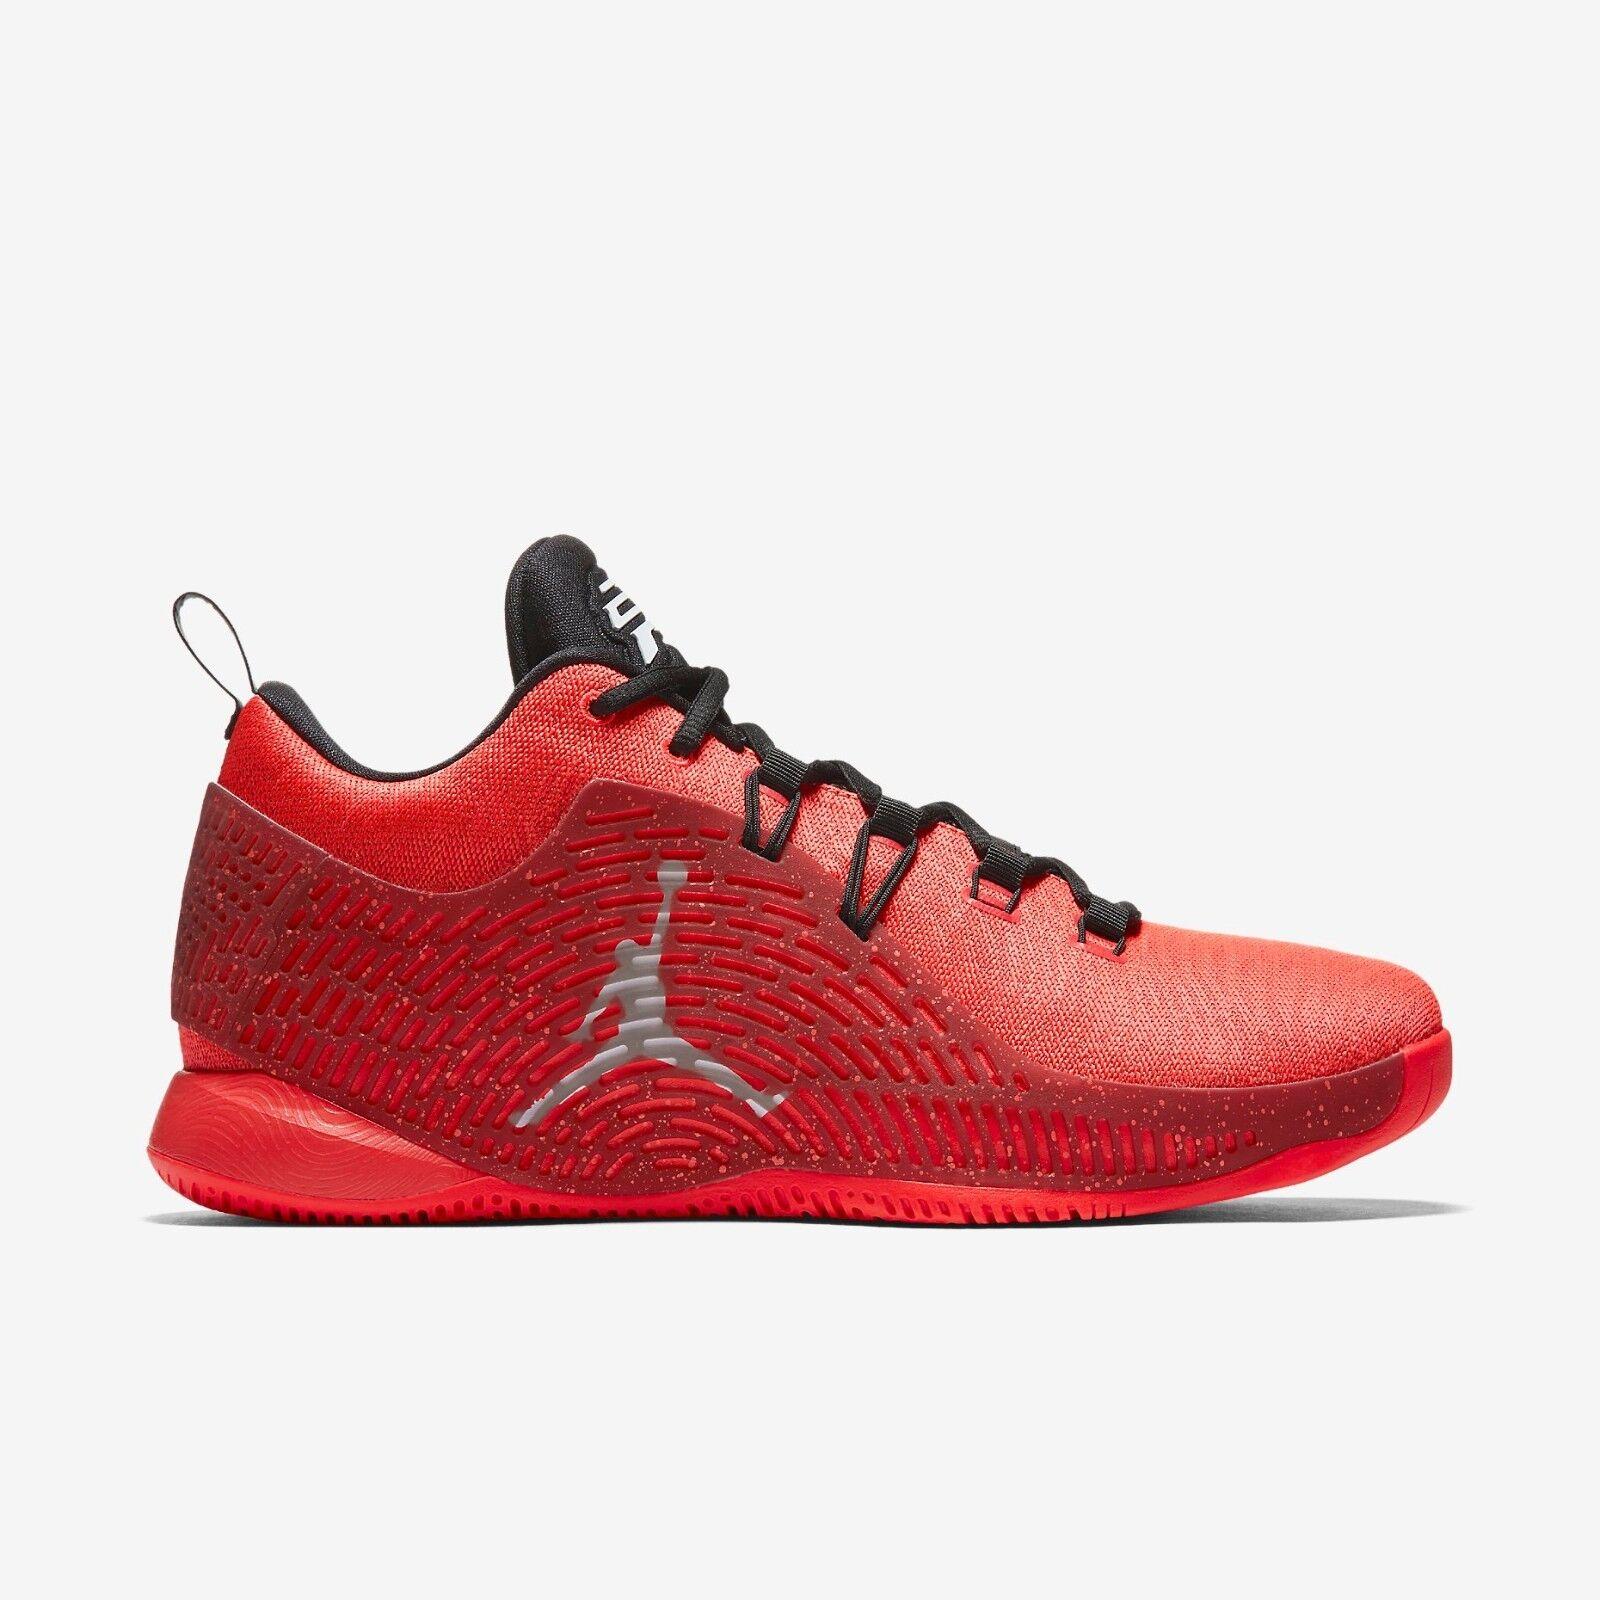 New Men's Jordan CP3.X Basketball Shoes (854294-600)  Men US 12 / Eur 46